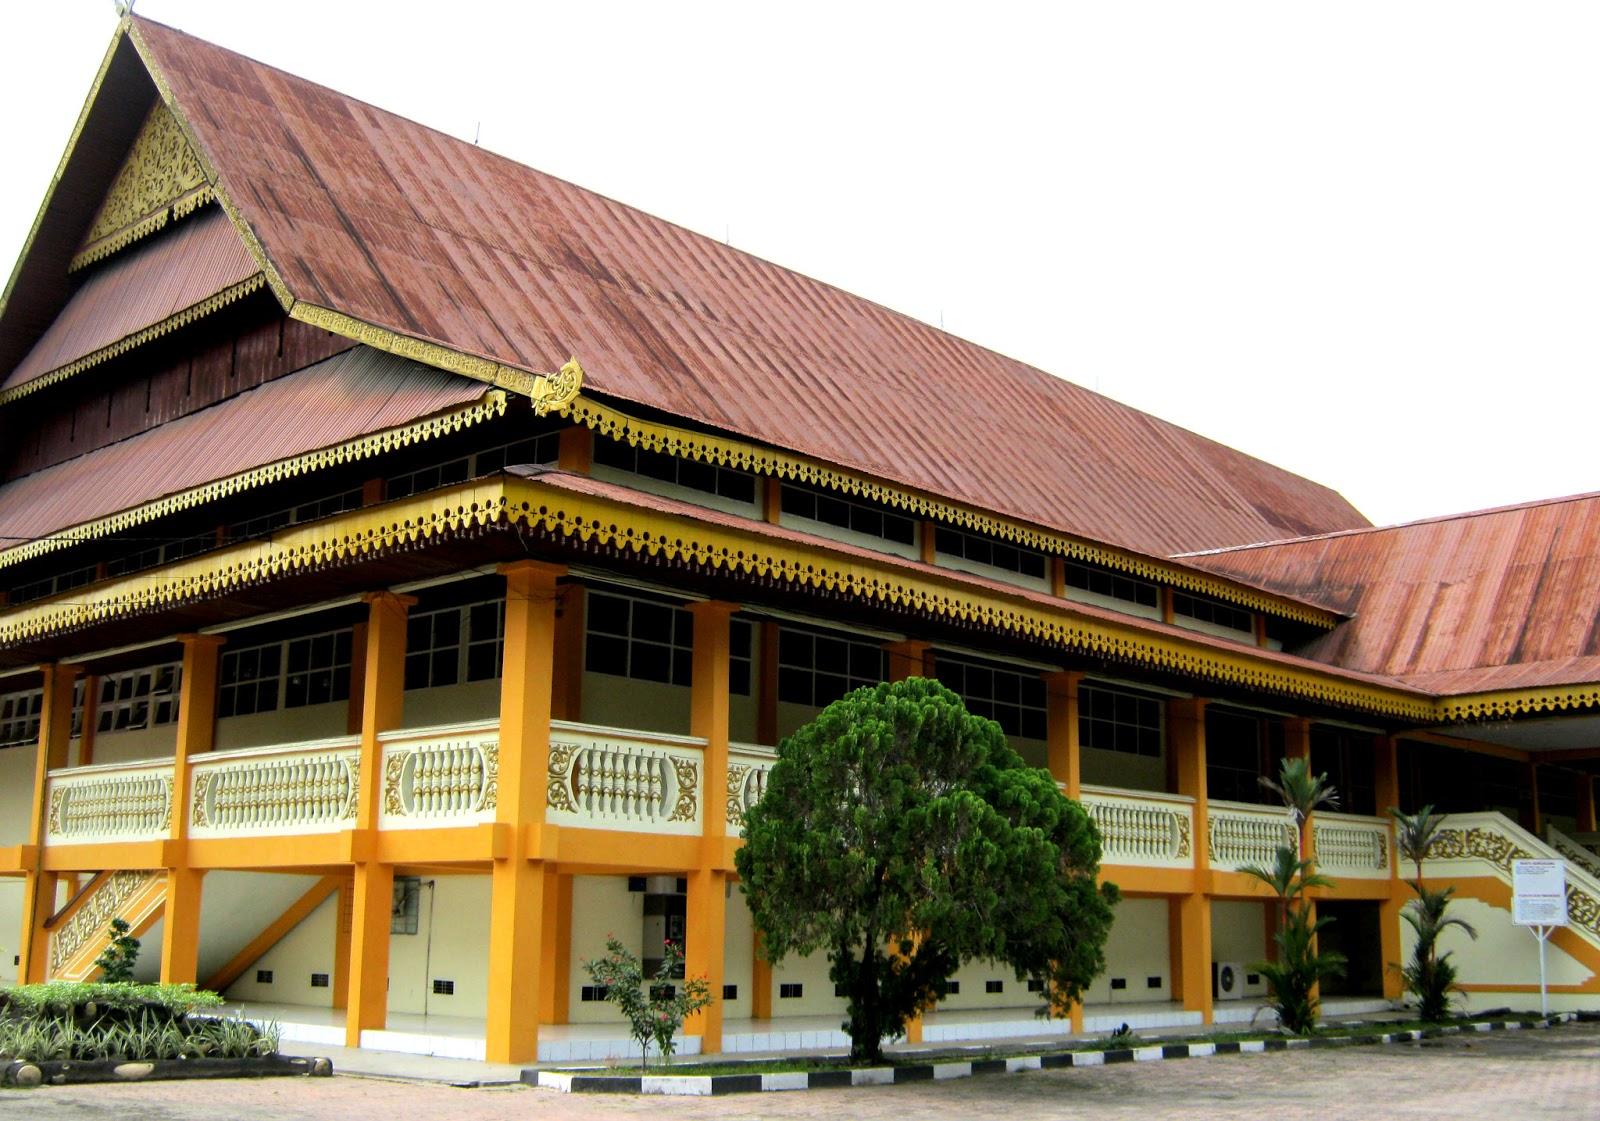 Foto Pemimpin Riau Museum Nila Utama Keliling Provinsi Musium Kota